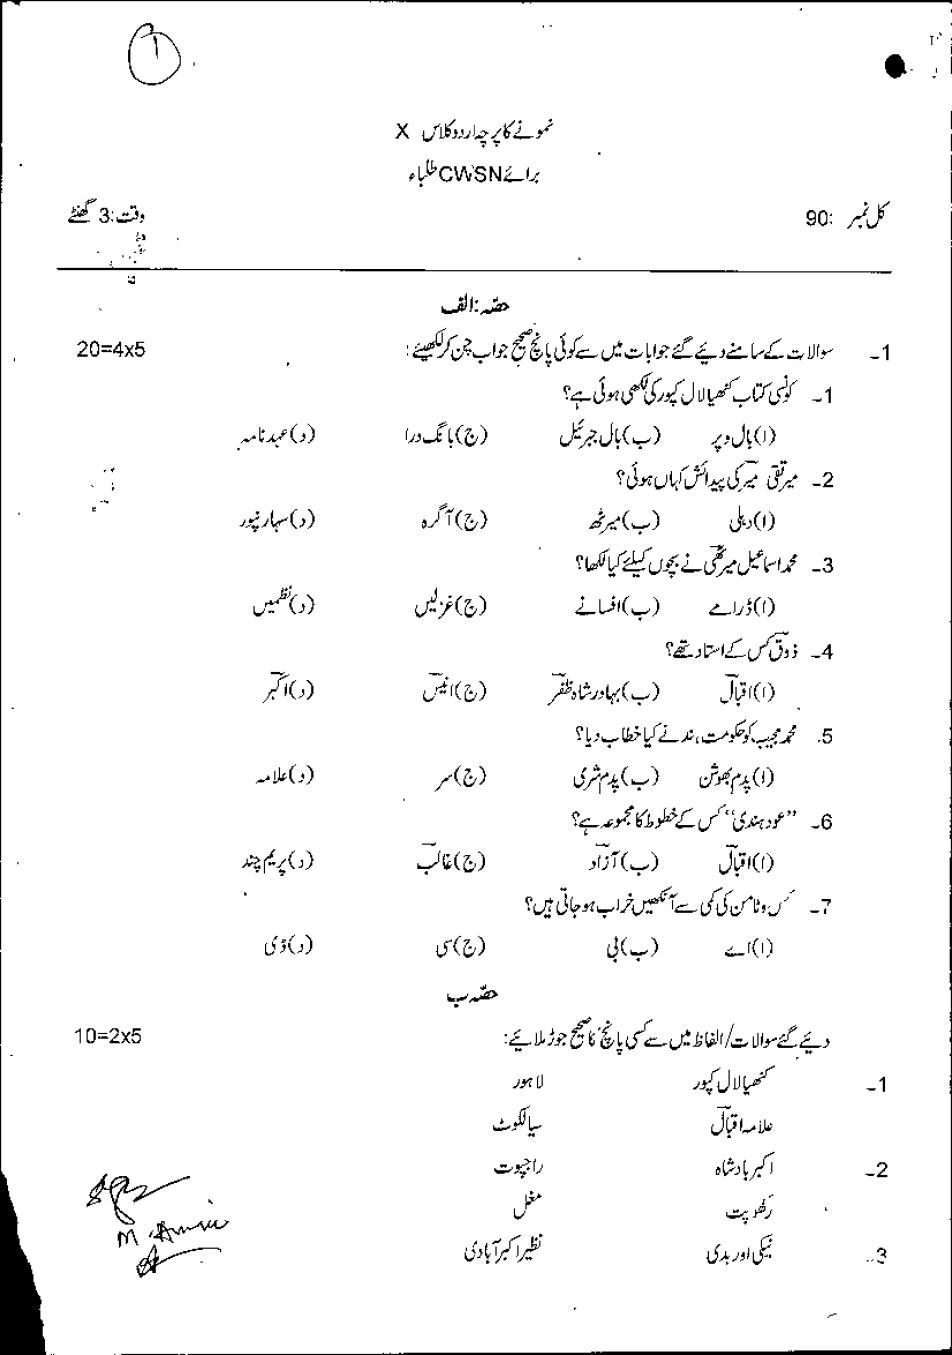 PSEB 10th Class Urdu Question Bank (Urdu Medium) - Page 1